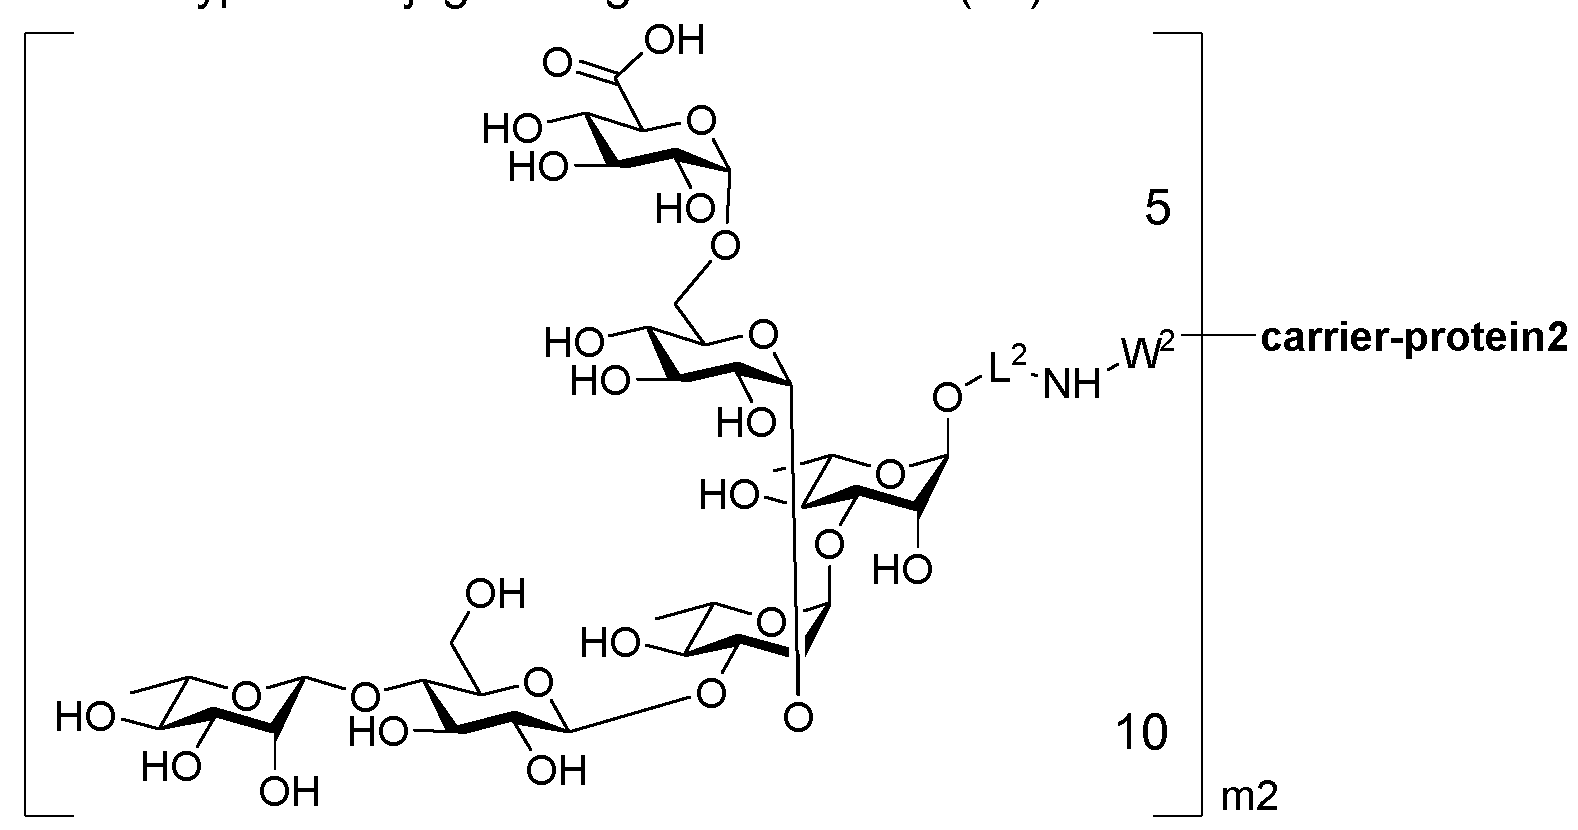 dot diagram for chlorine wiring diagram database Lewis Dot Structure for Elements 25 50 lewis dot structure of ca2 wiring diagram database dot diagram for holmium dot diagram for chlorine